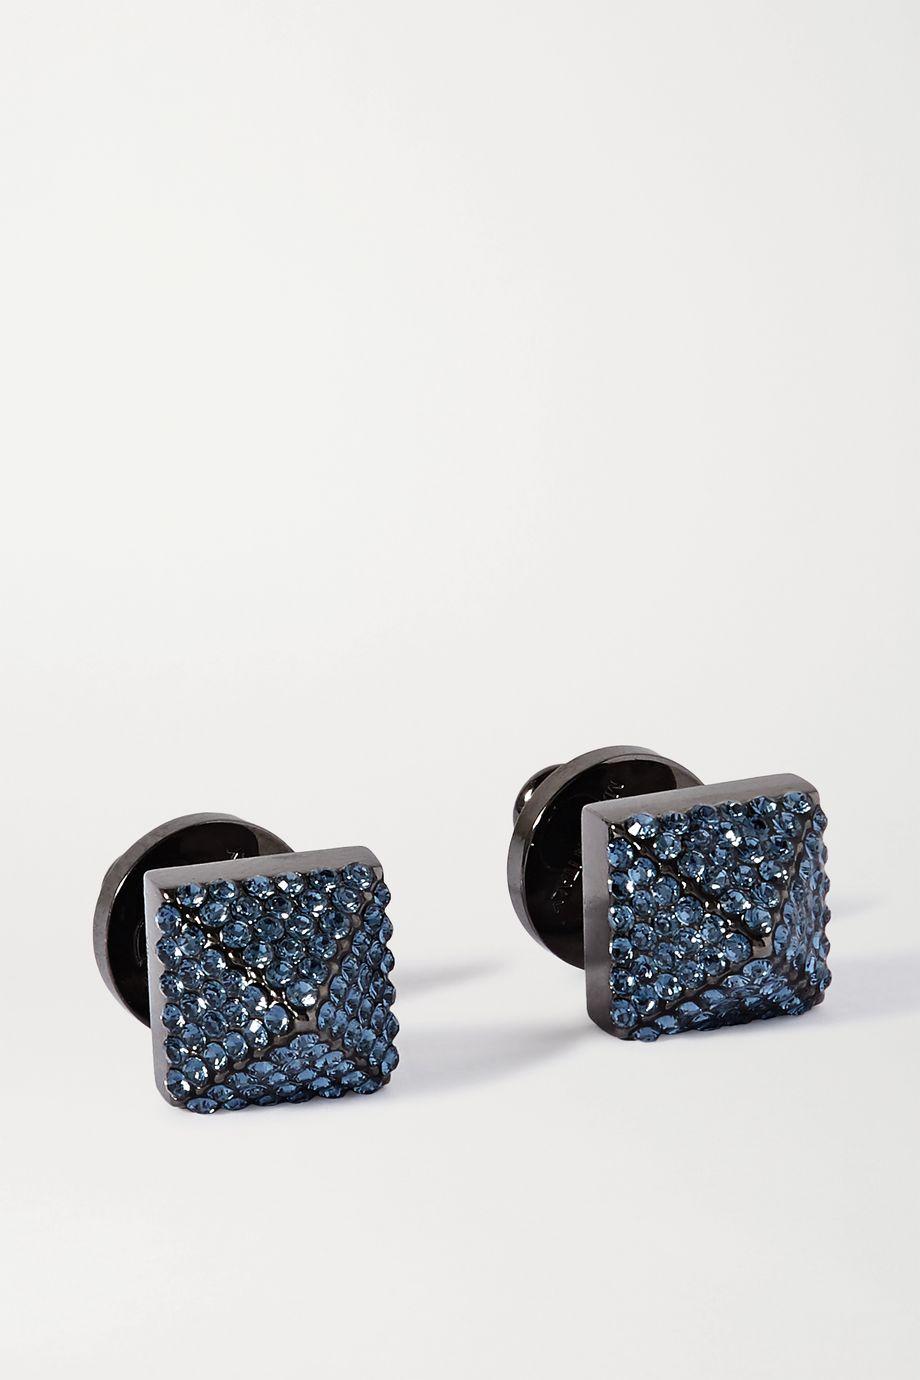 Valentino Valentino Garavani gunmetal-tone crystal earrings